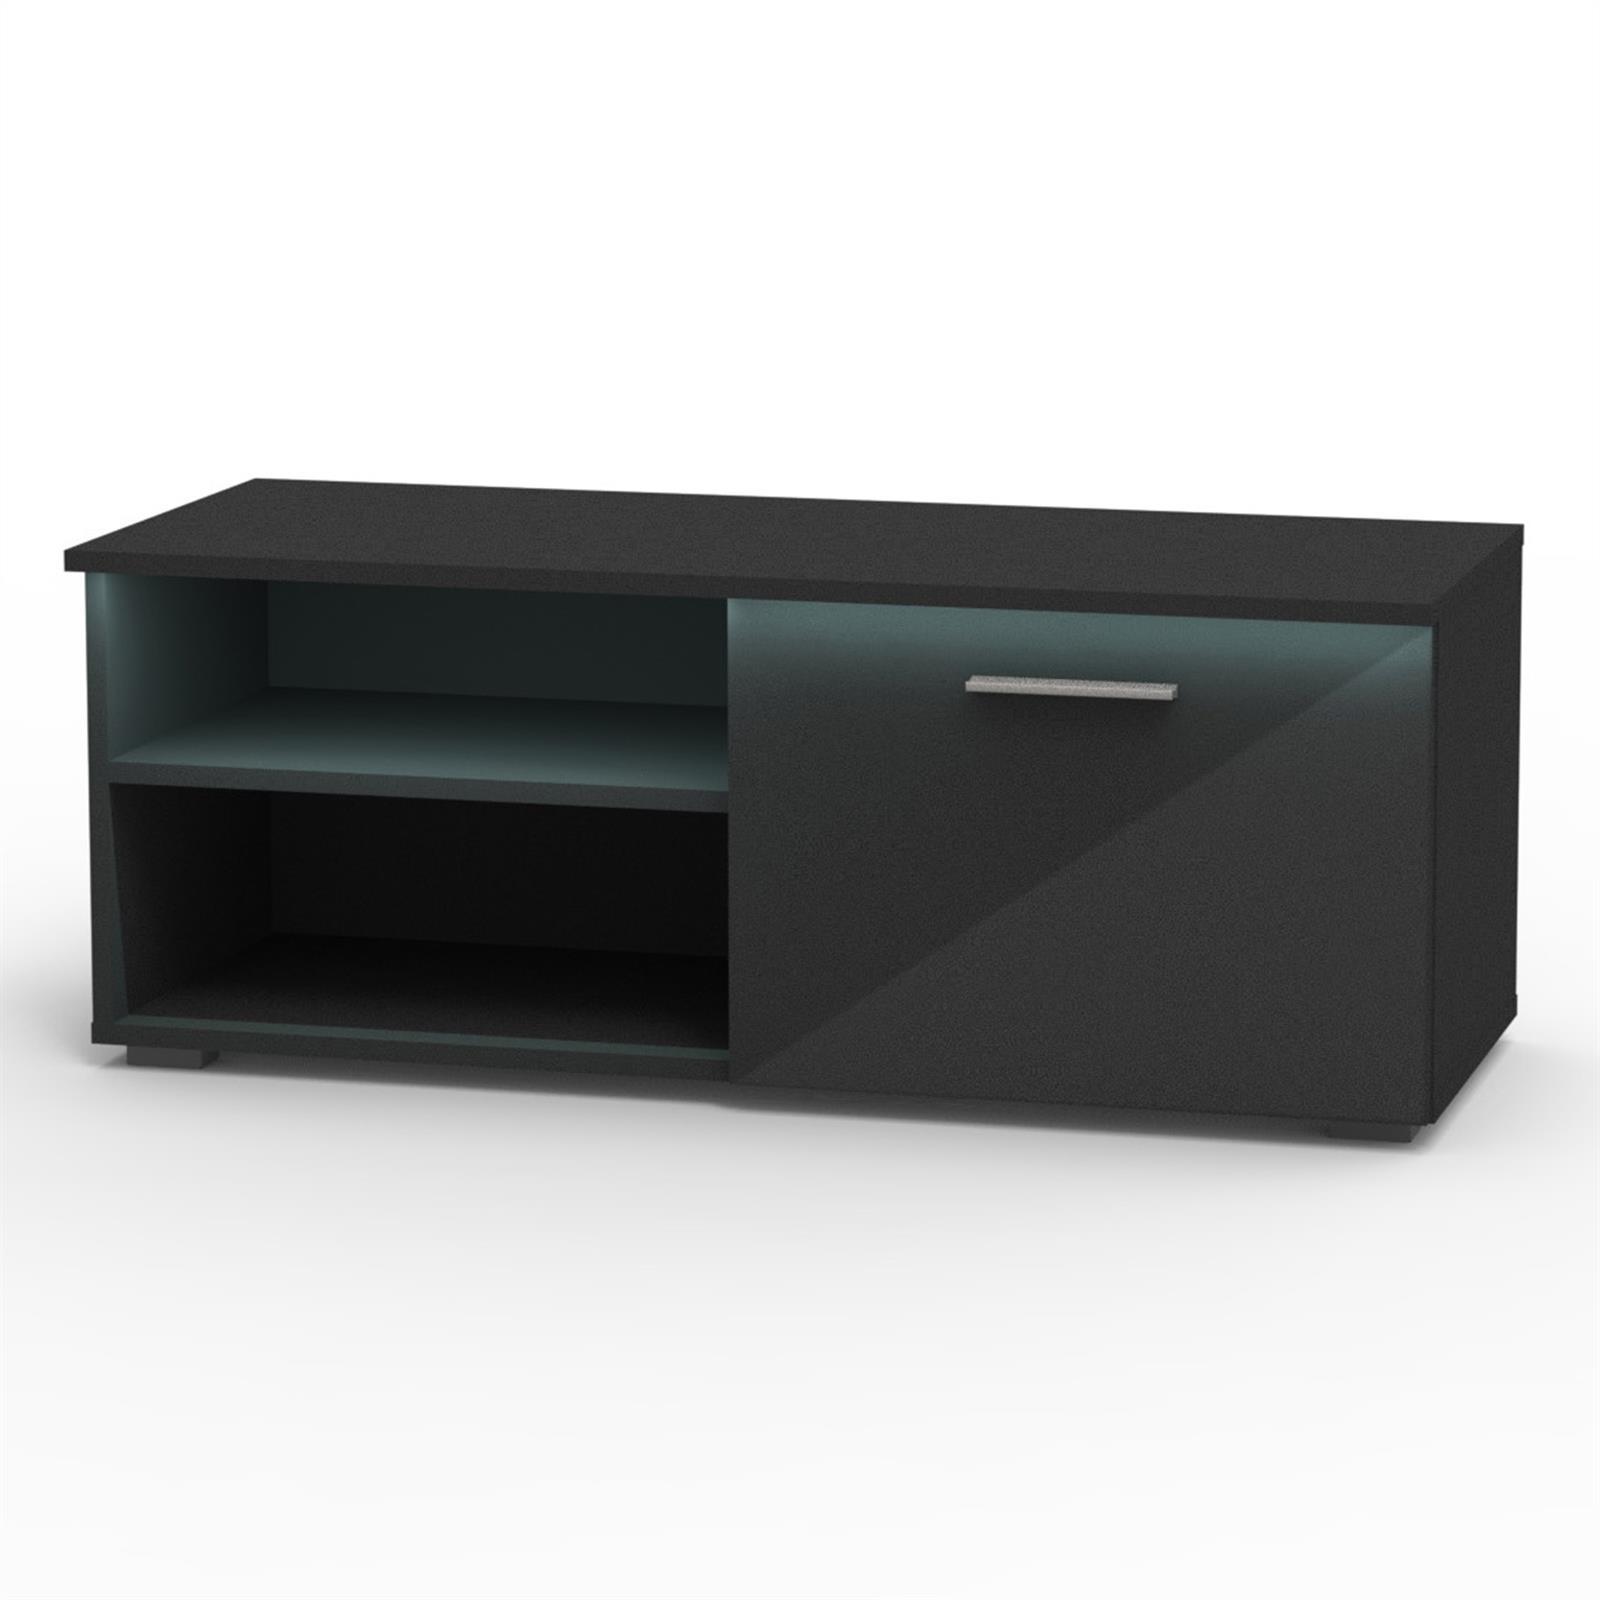 tv lowboard in hochglanz 3 farben mit led beleuchtung fernseh schrank rack ebay. Black Bedroom Furniture Sets. Home Design Ideas